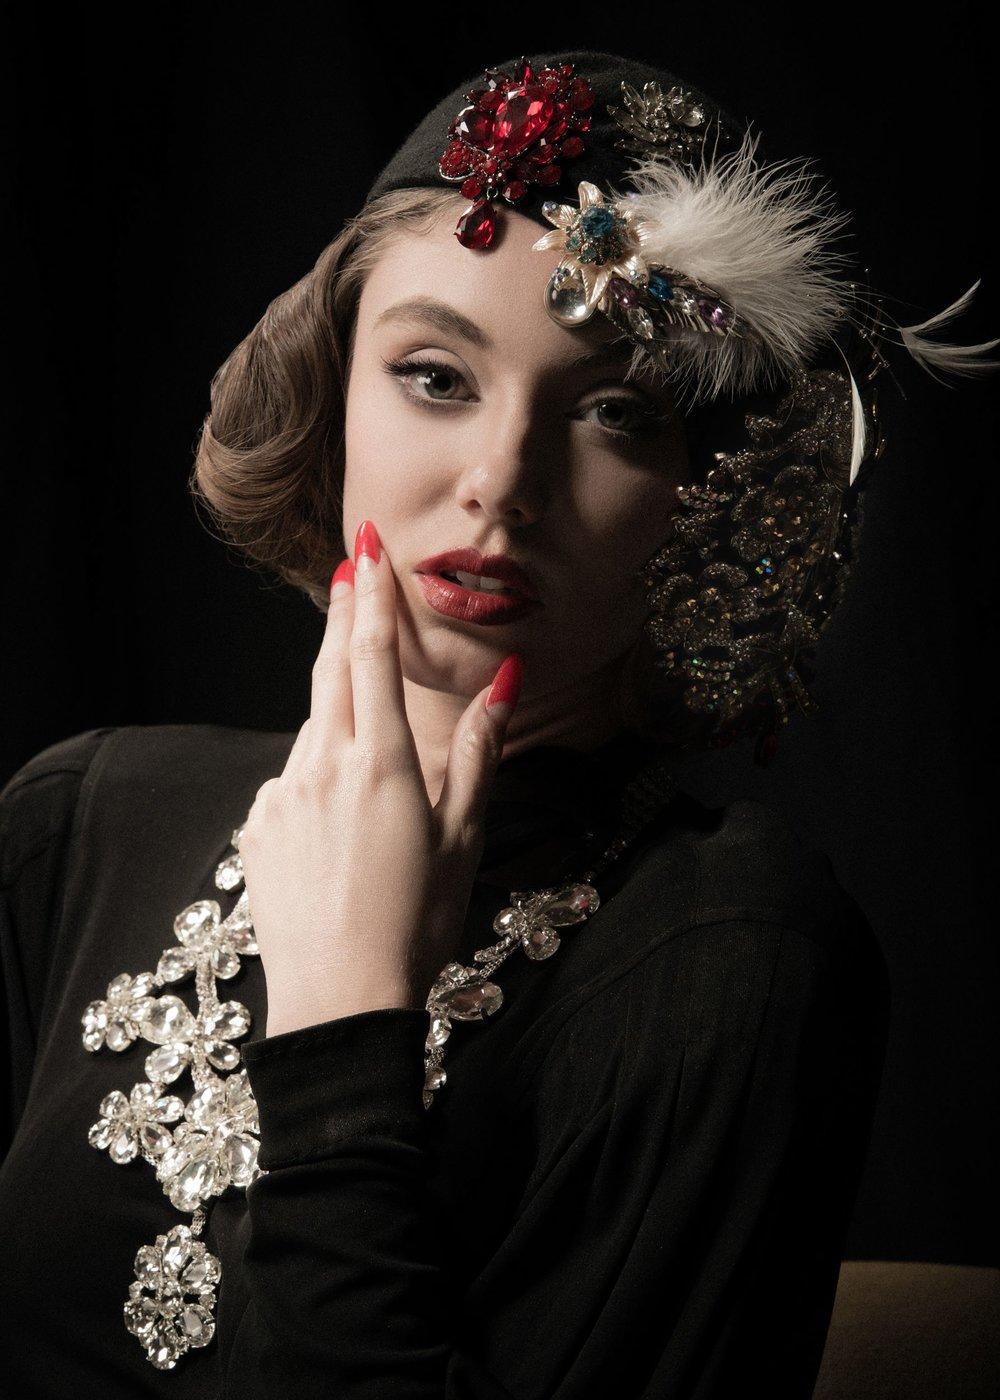 Beauty Photographers Mysterious